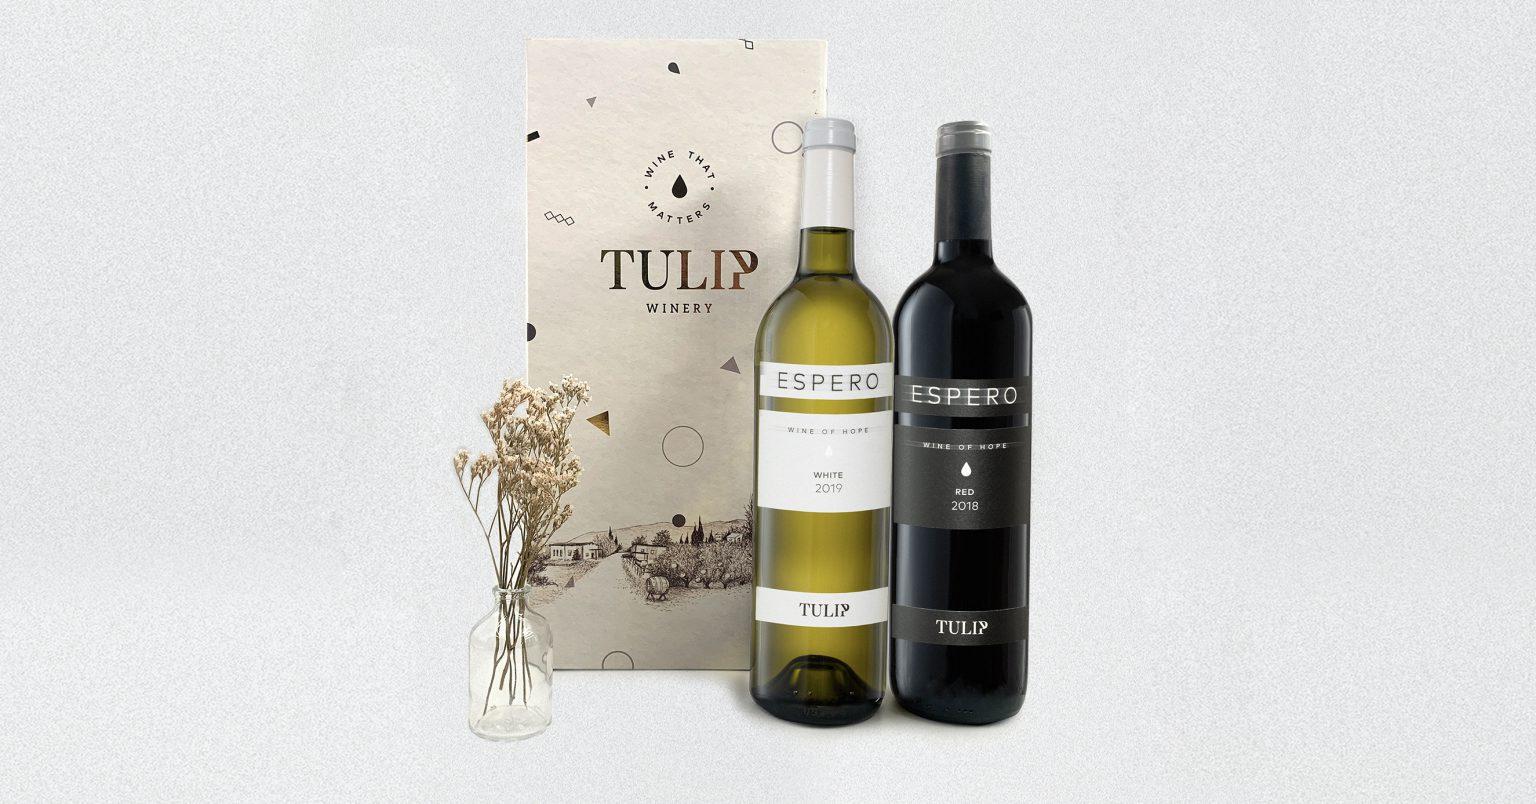 04_wine_that_matters_1200x628